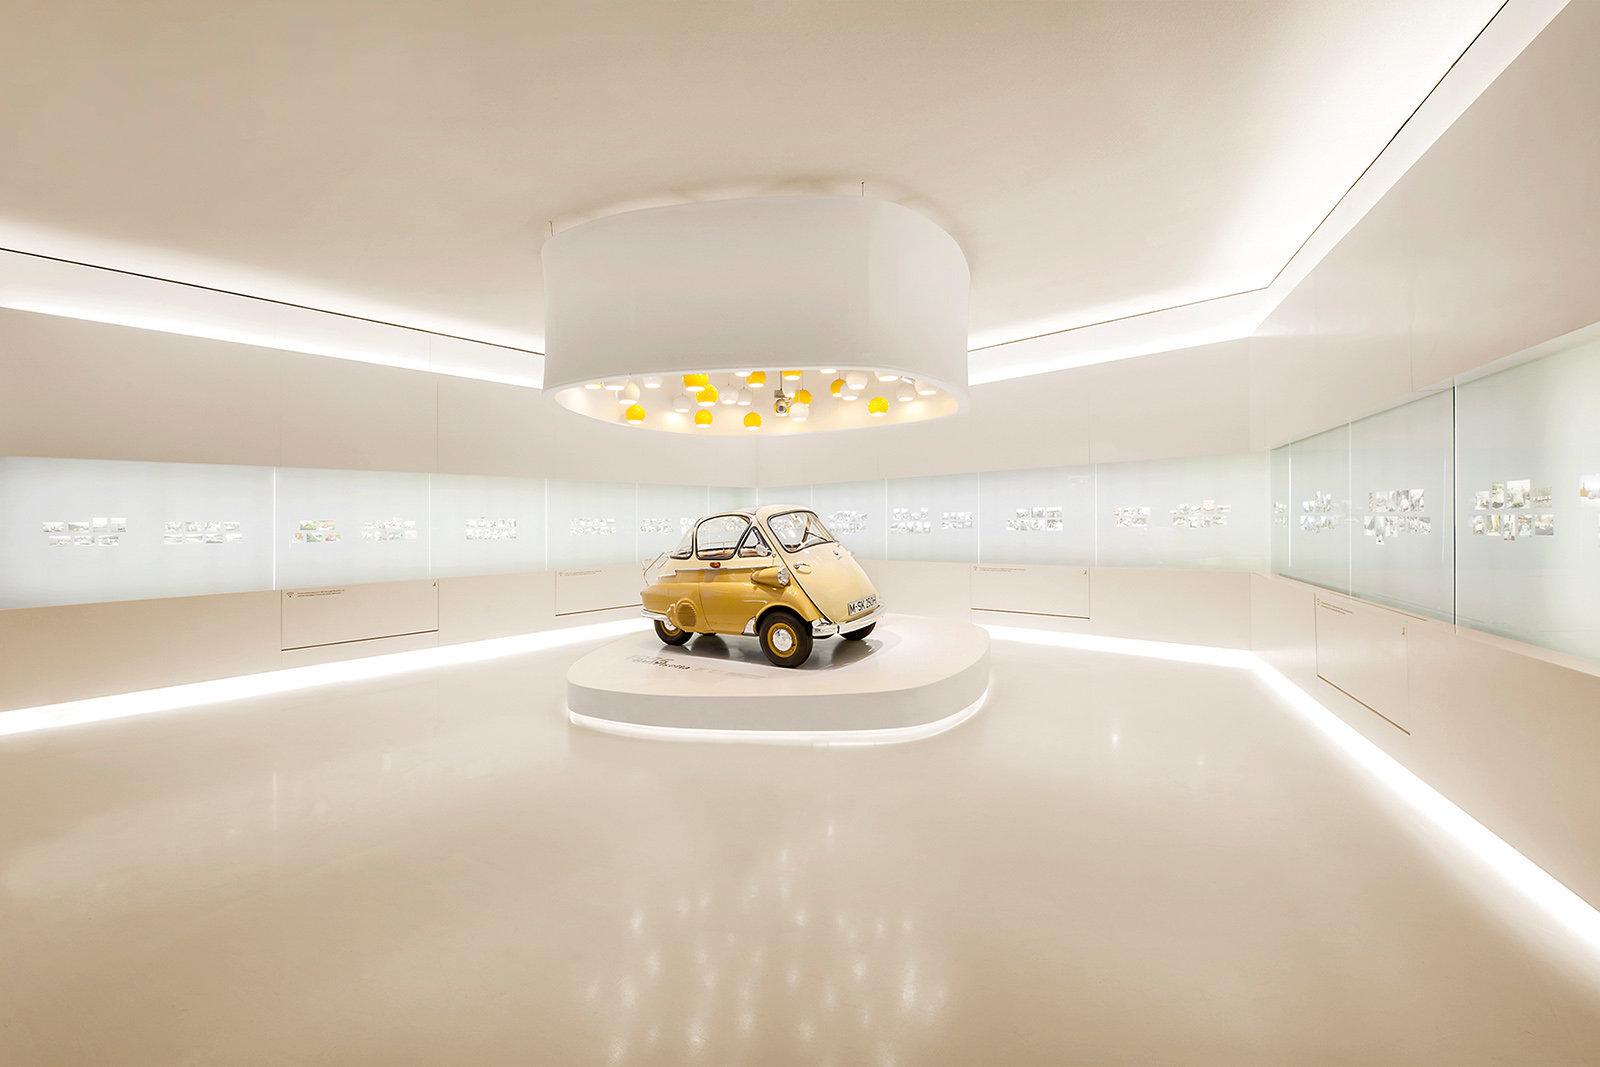 Museumsfotografie-BMW-Museum-9.jpg